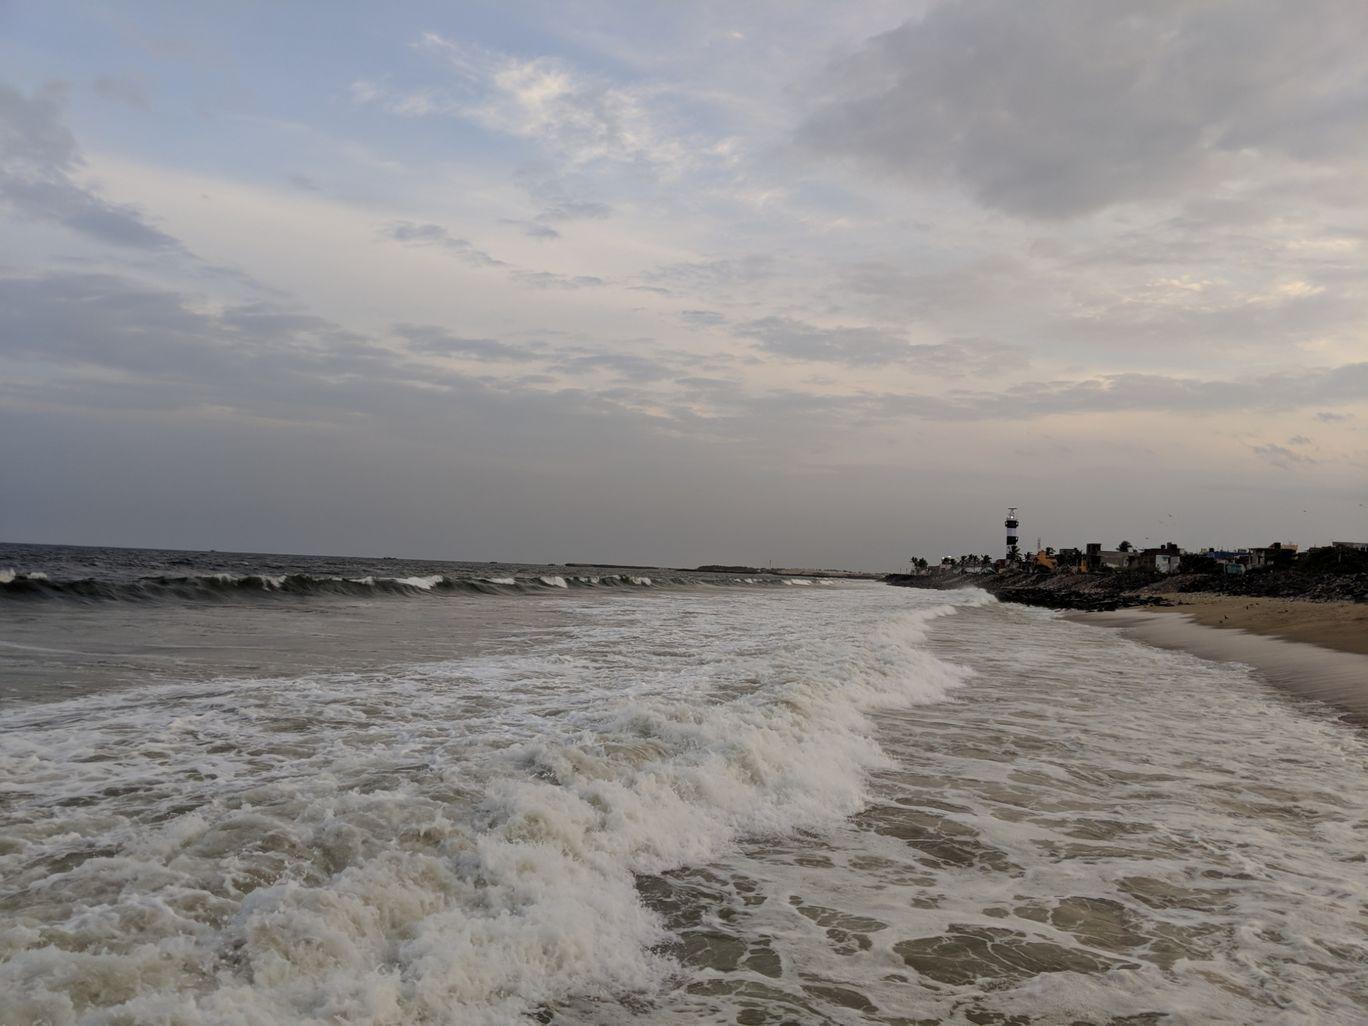 Photo of Promenade Beach By Michael Dwarakanadh